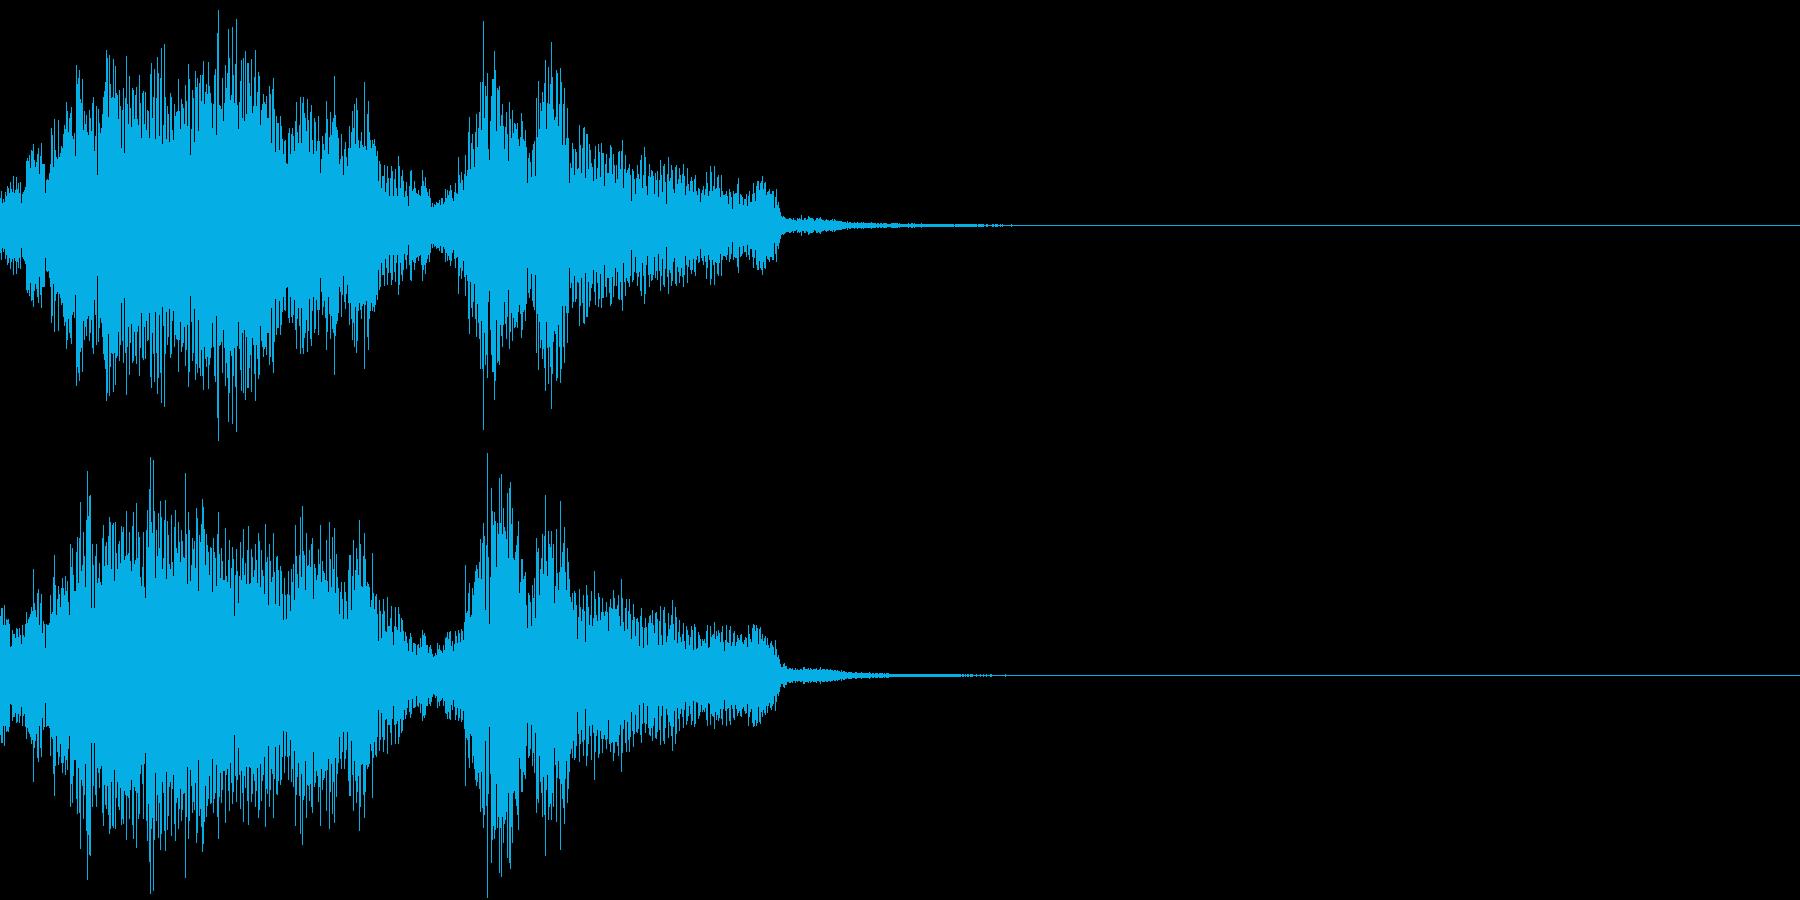 Monster 未知の生物の発する音声3の再生済みの波形